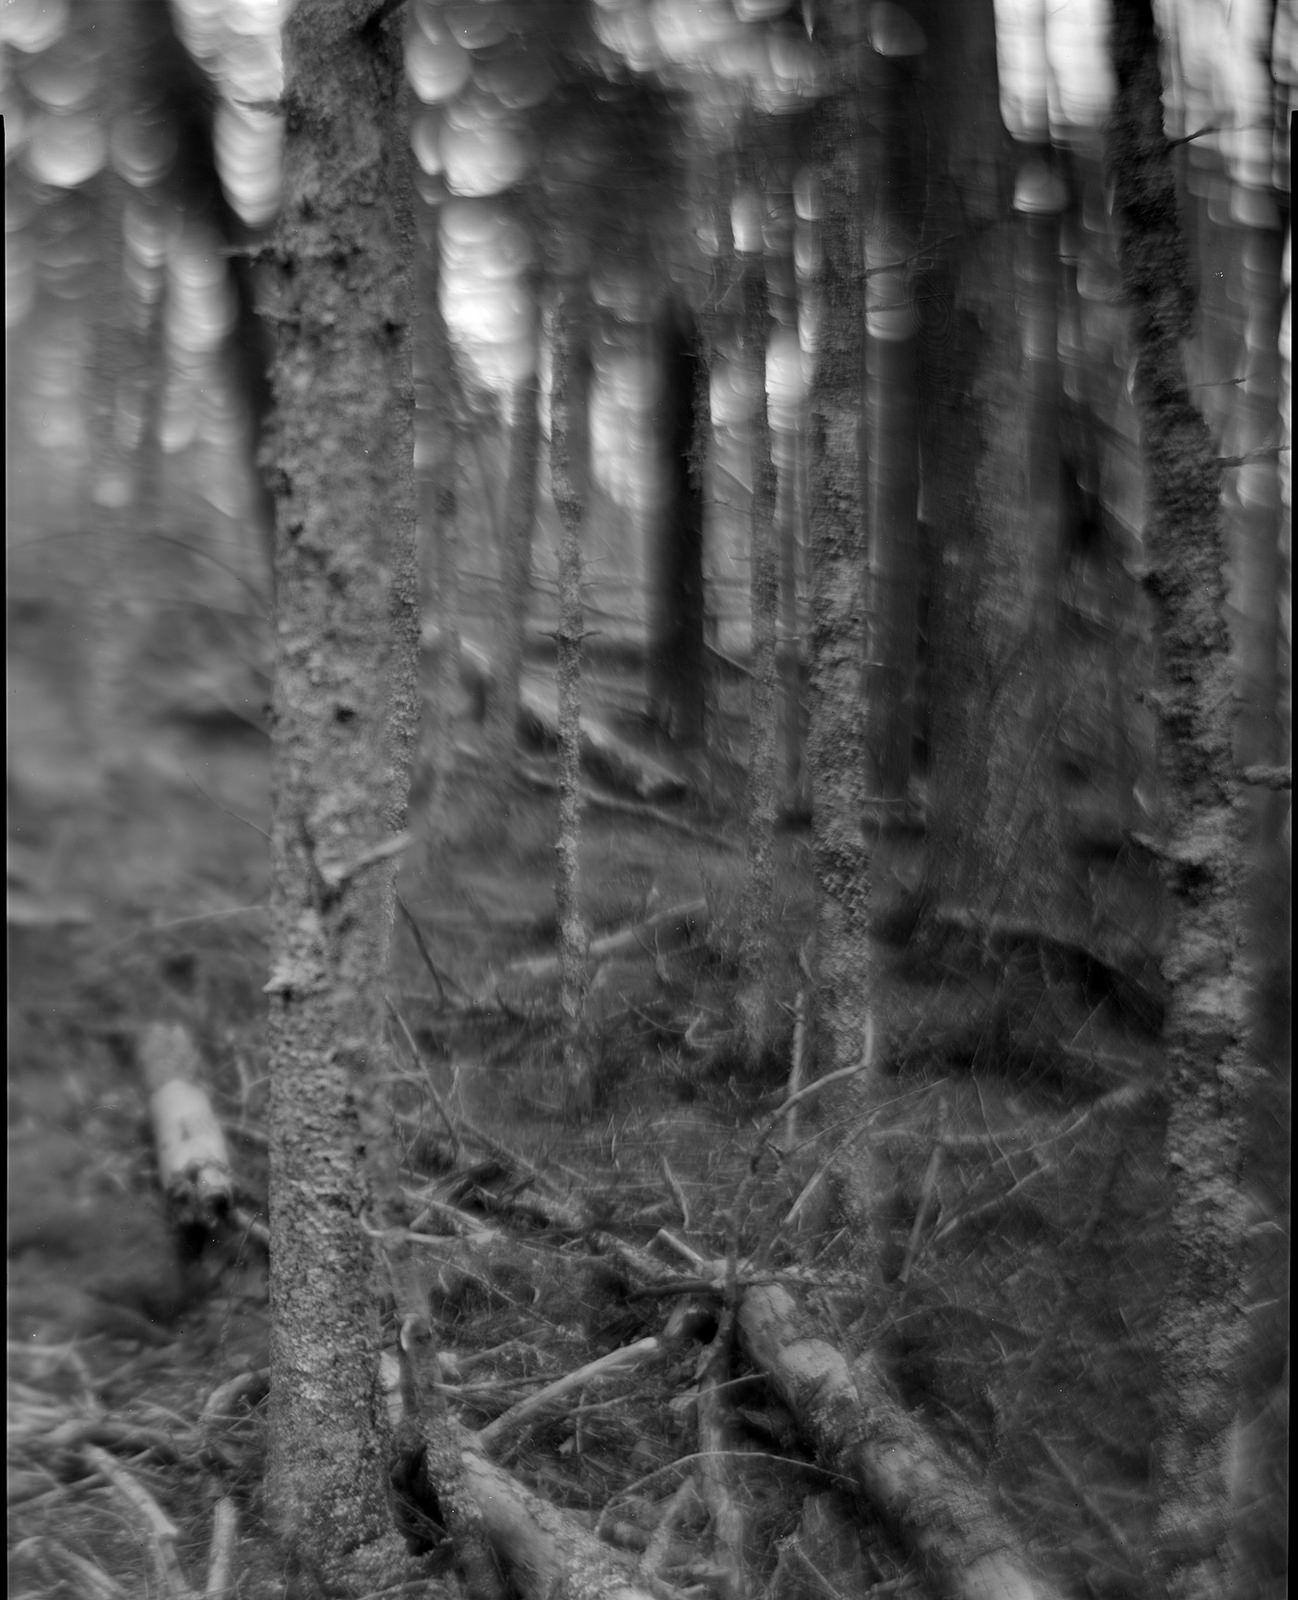 https://flic.kr/p/qmY11u | img564 | trees at Birch Point Beach State Park, Owls Head Maine. December 2014. B&J 8x10 field camera and Kodak 305 portrait soft focus lens. tmy2 tmax 400 8x10 film in pyrocat hd